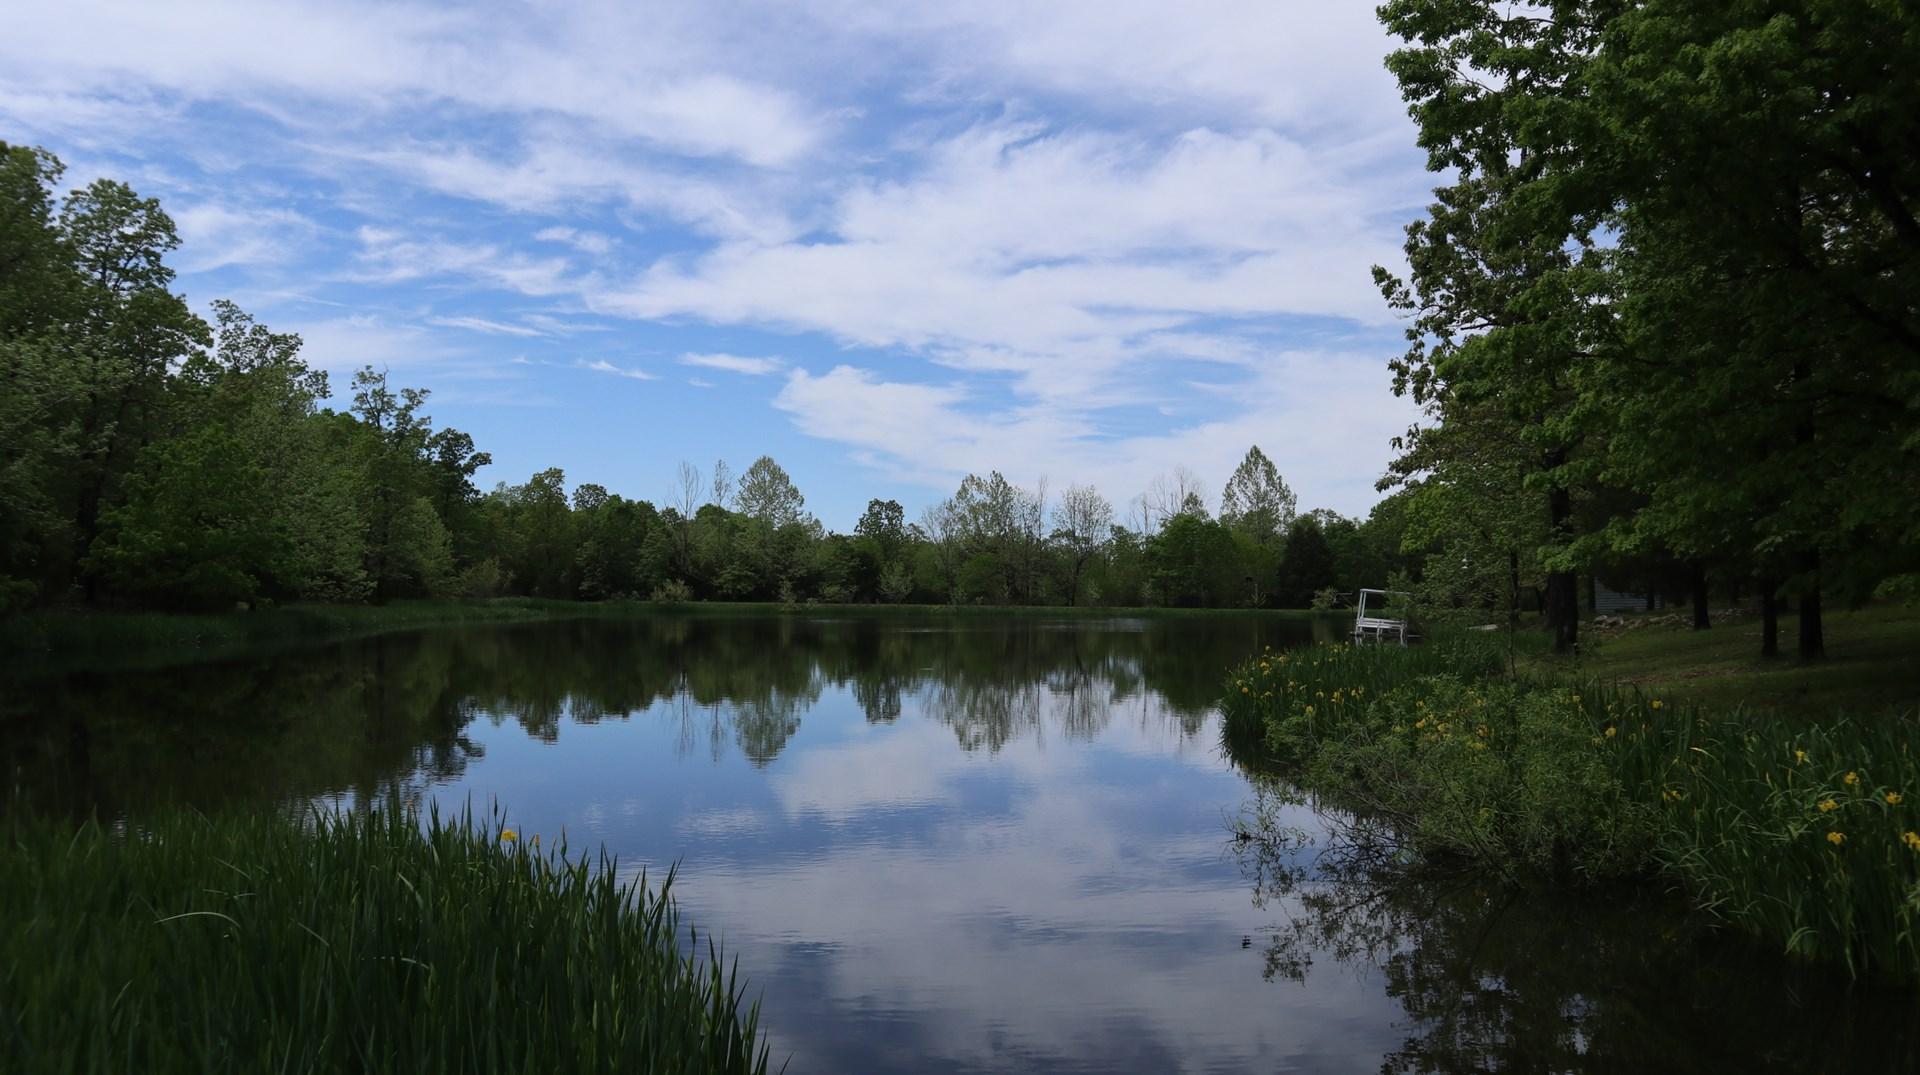 Secluded Ozarks Hobby Farm with Lake for Sale Near Salem